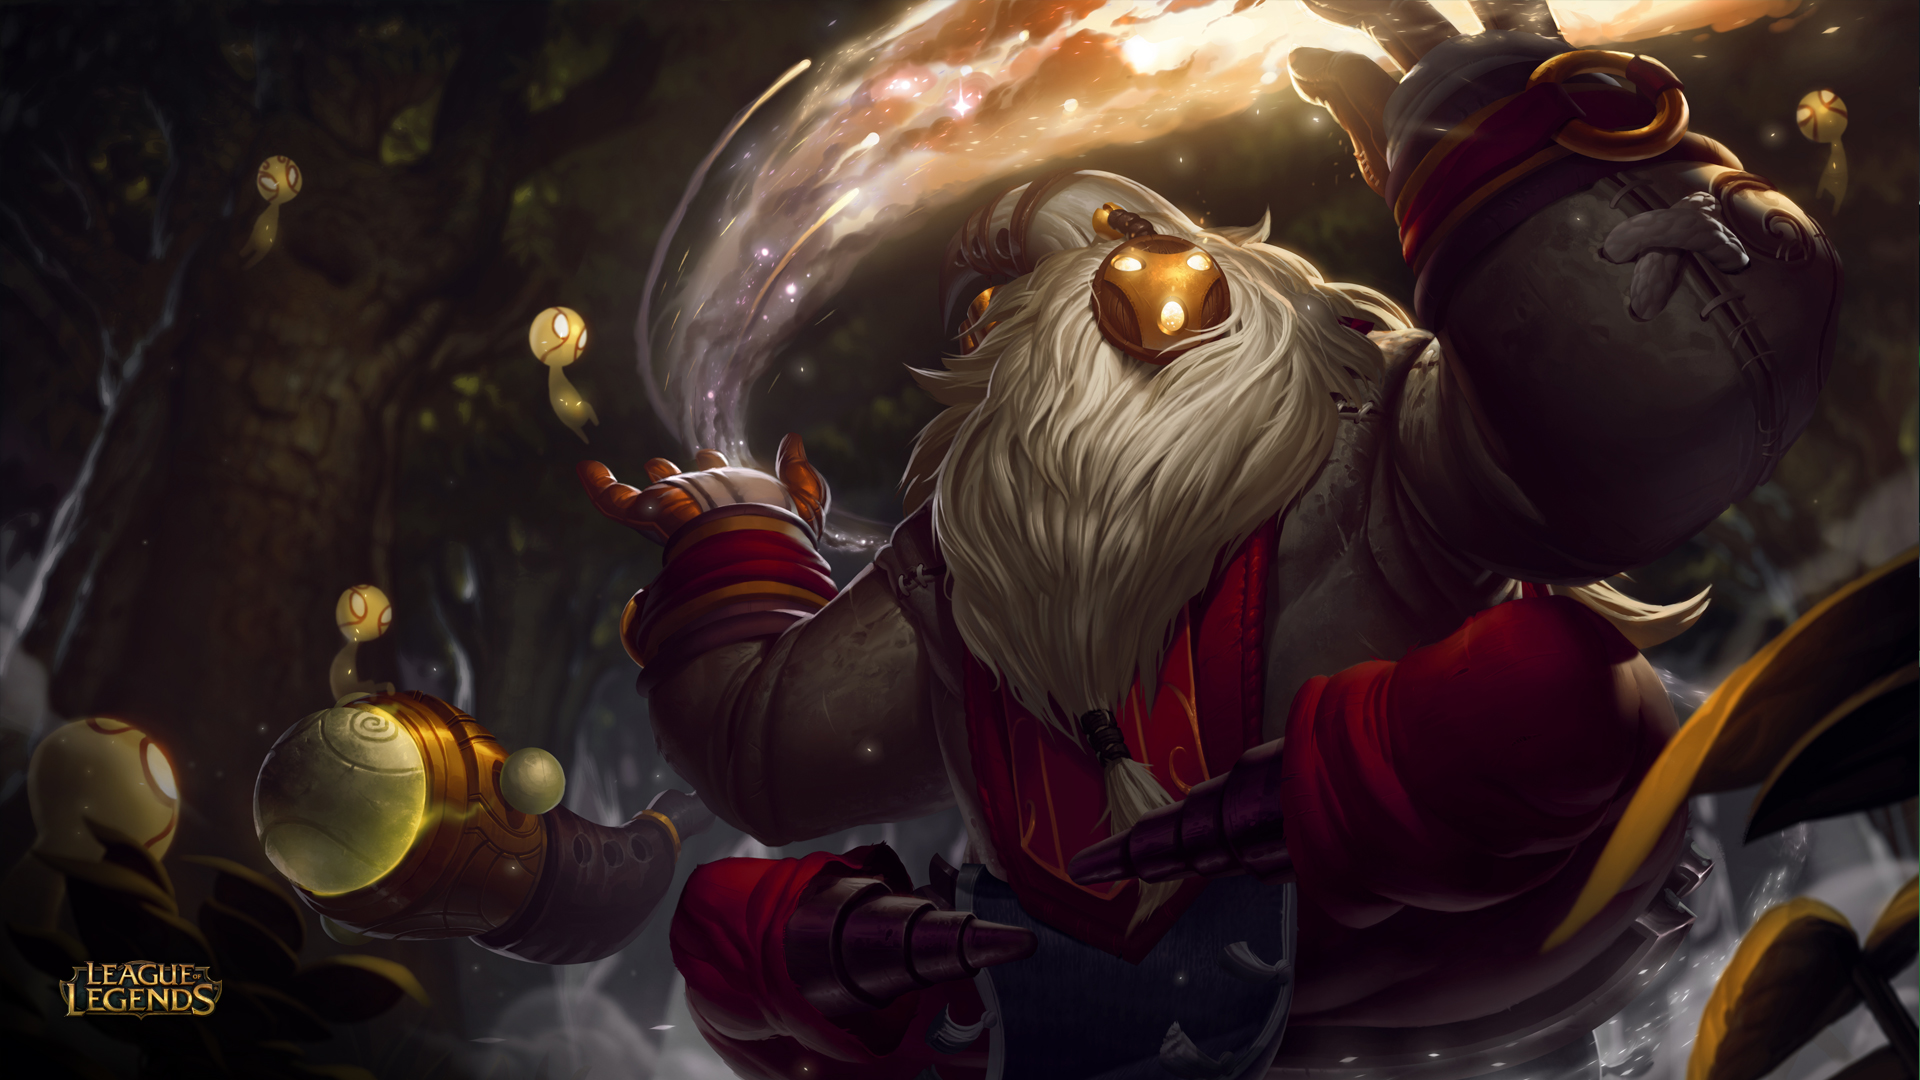 Bard the Wandering Caretaker (guide, build) - новый чемпион в League of Legends